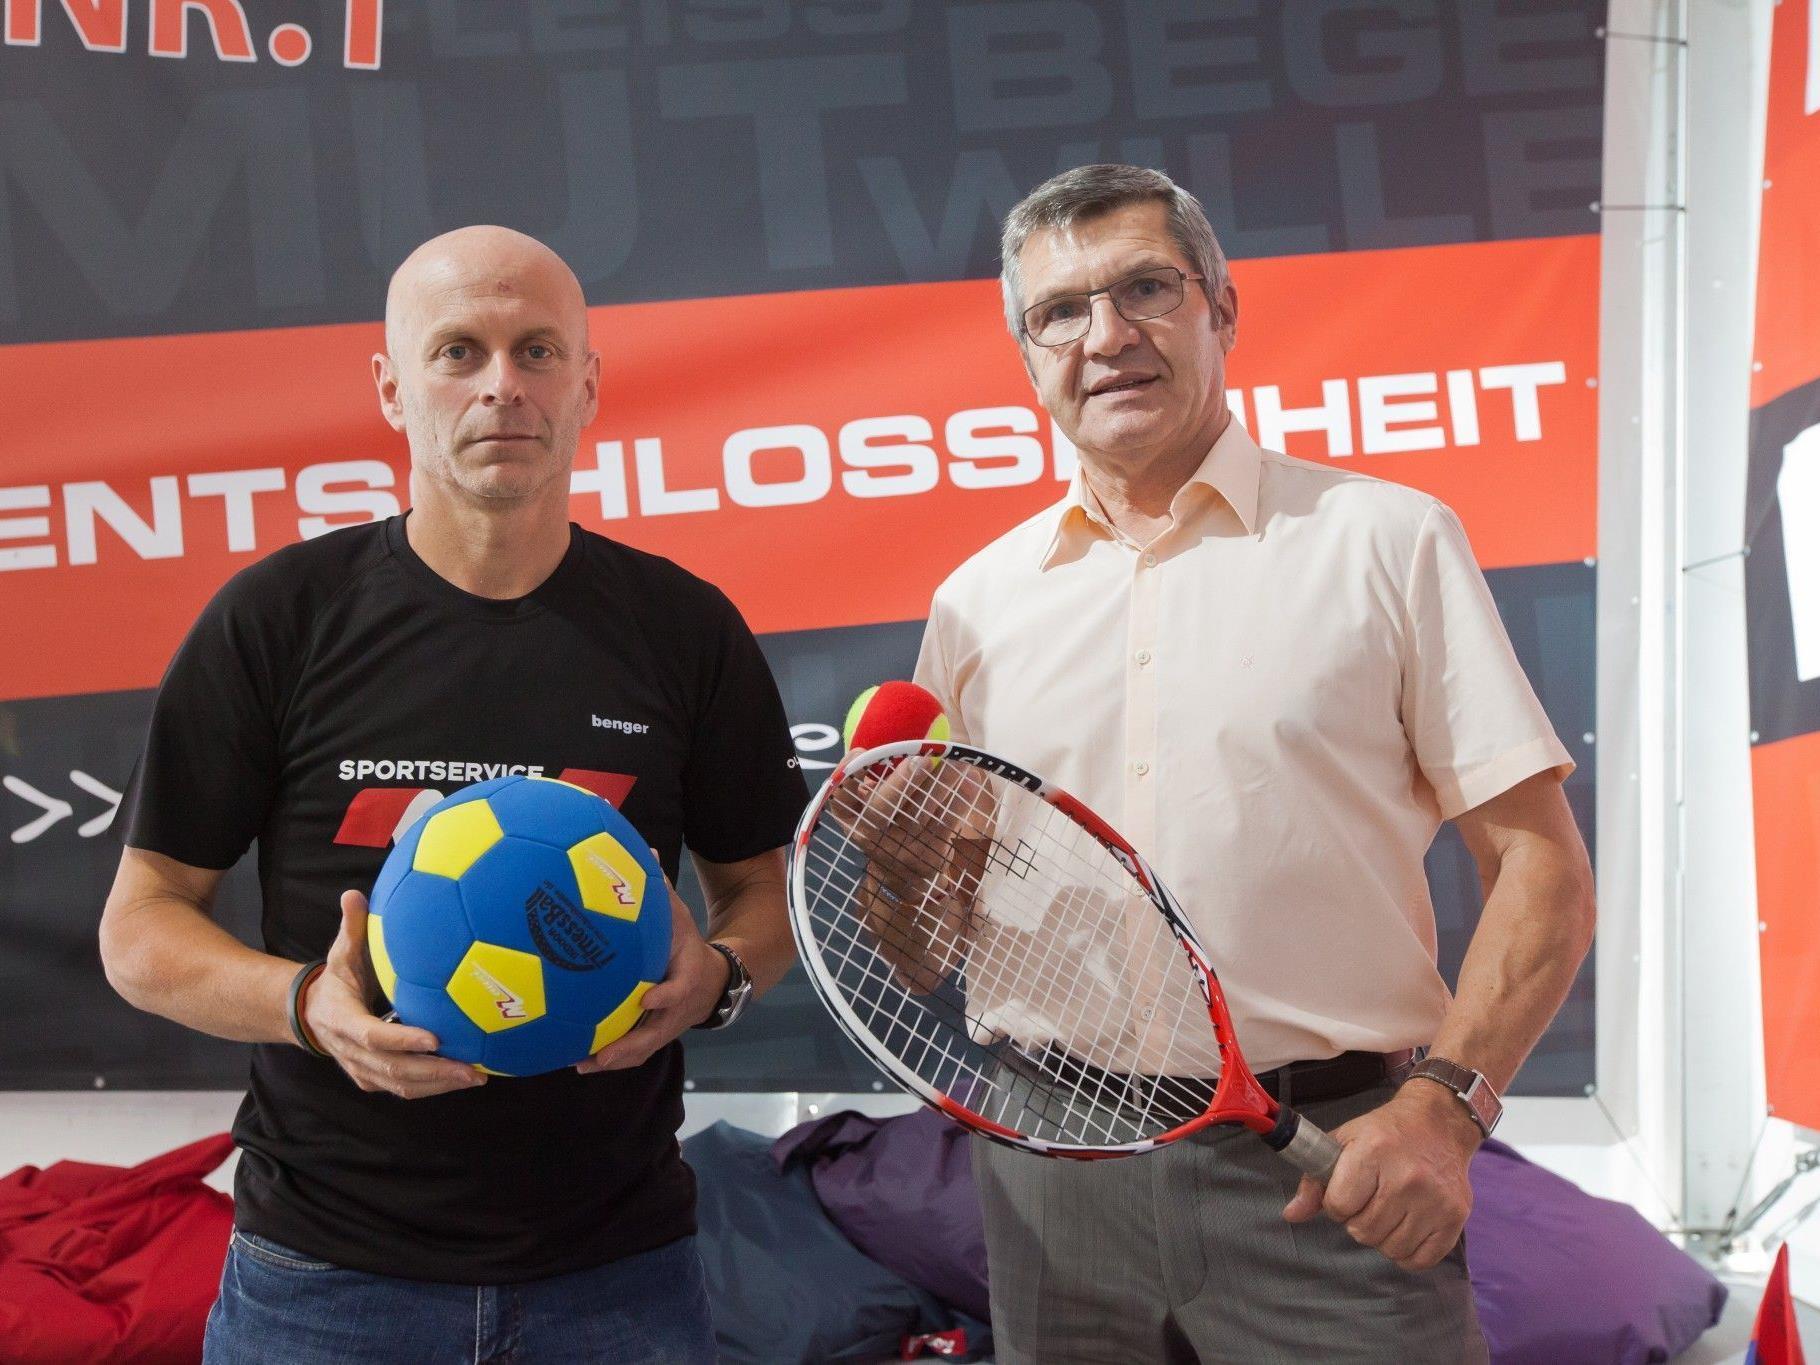 Causa Sportservice: Opposition fordert Aufklärung